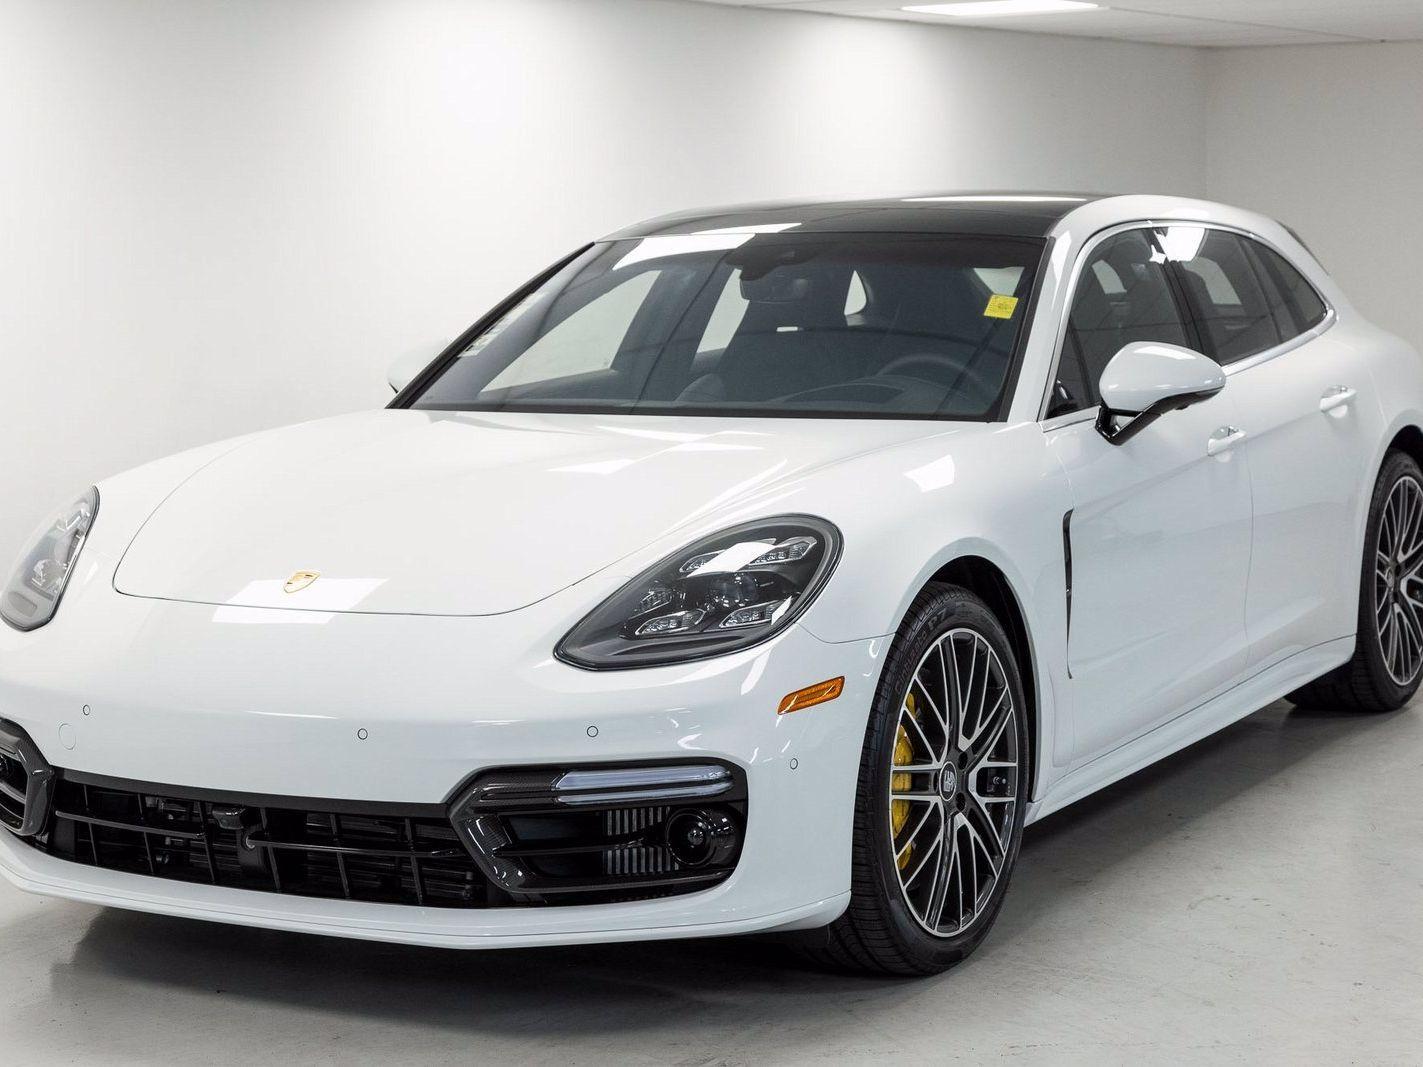 2021 Porsche Panamera Turbo S Sport Turismo – 2